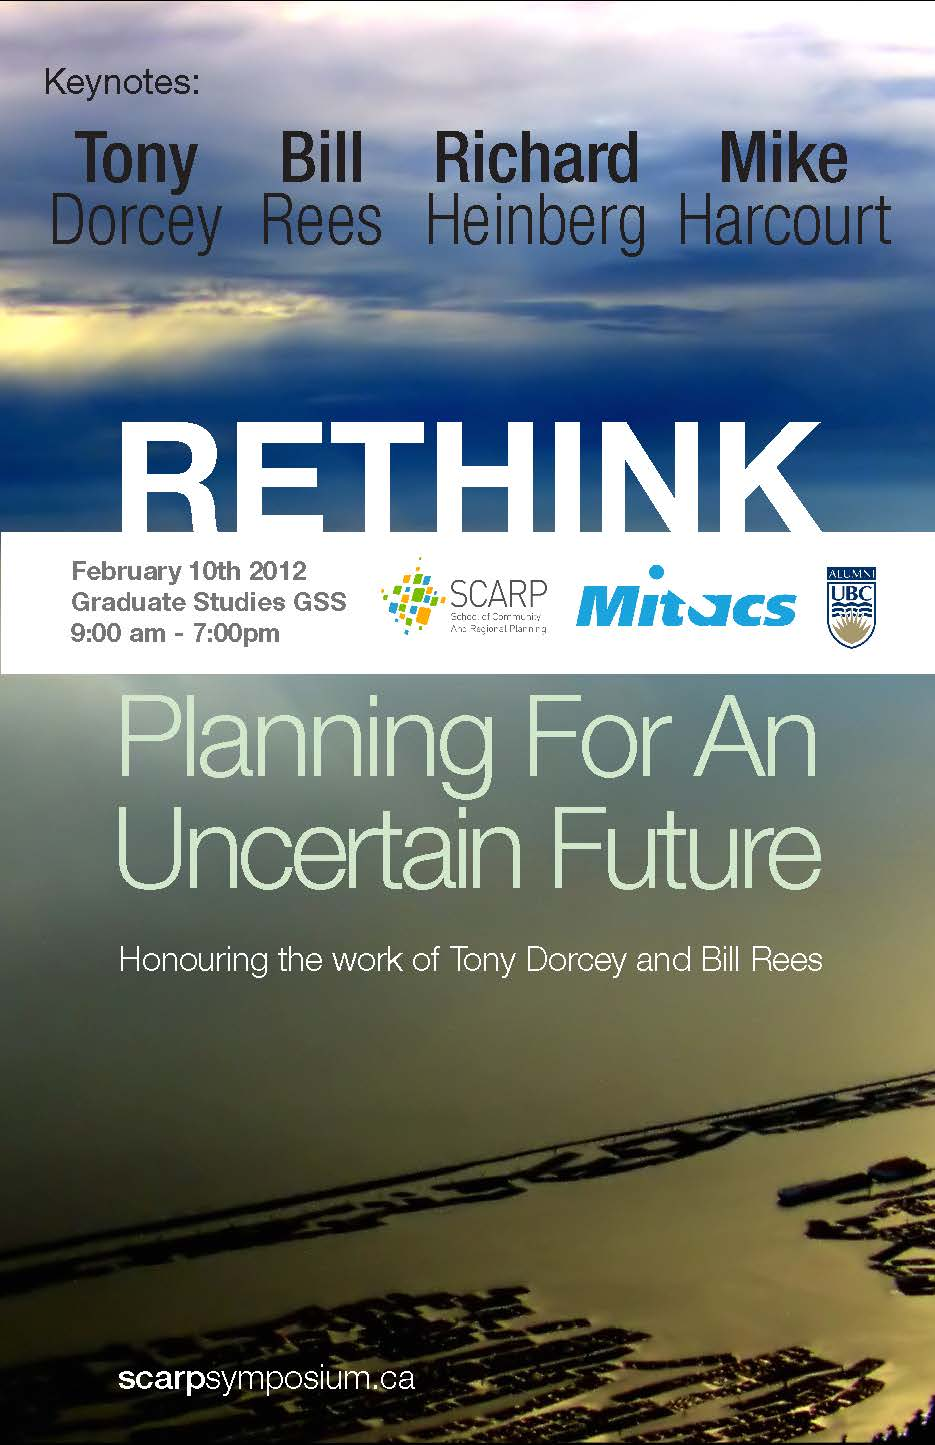 SCARP Symposium: Planning for an Uncertain Urban Future